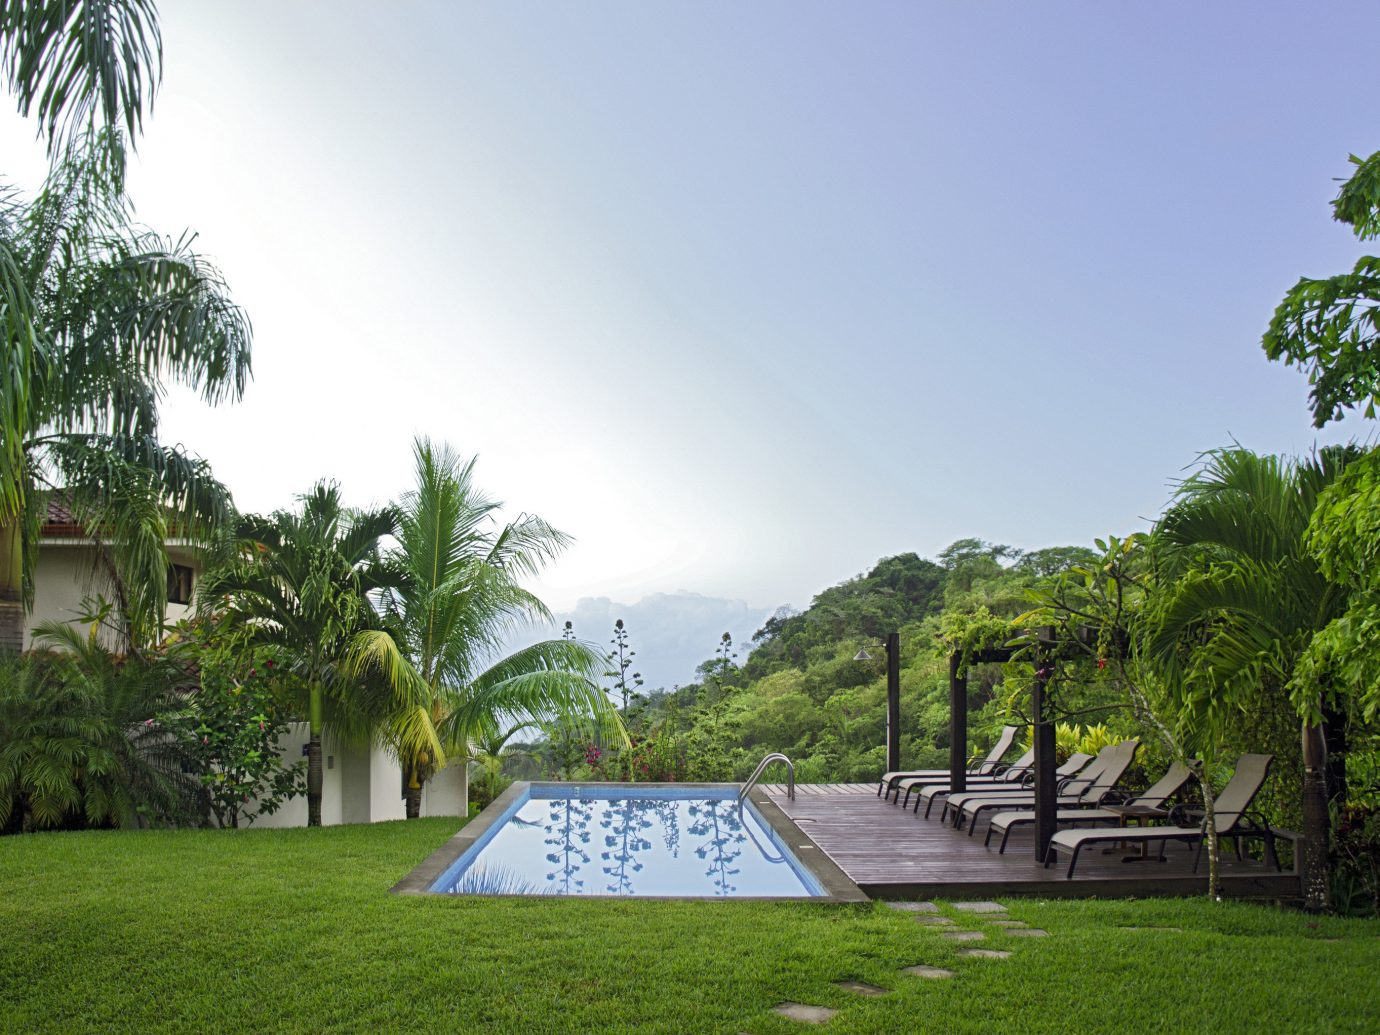 Pool at Casa Frangipani in Costa Rica